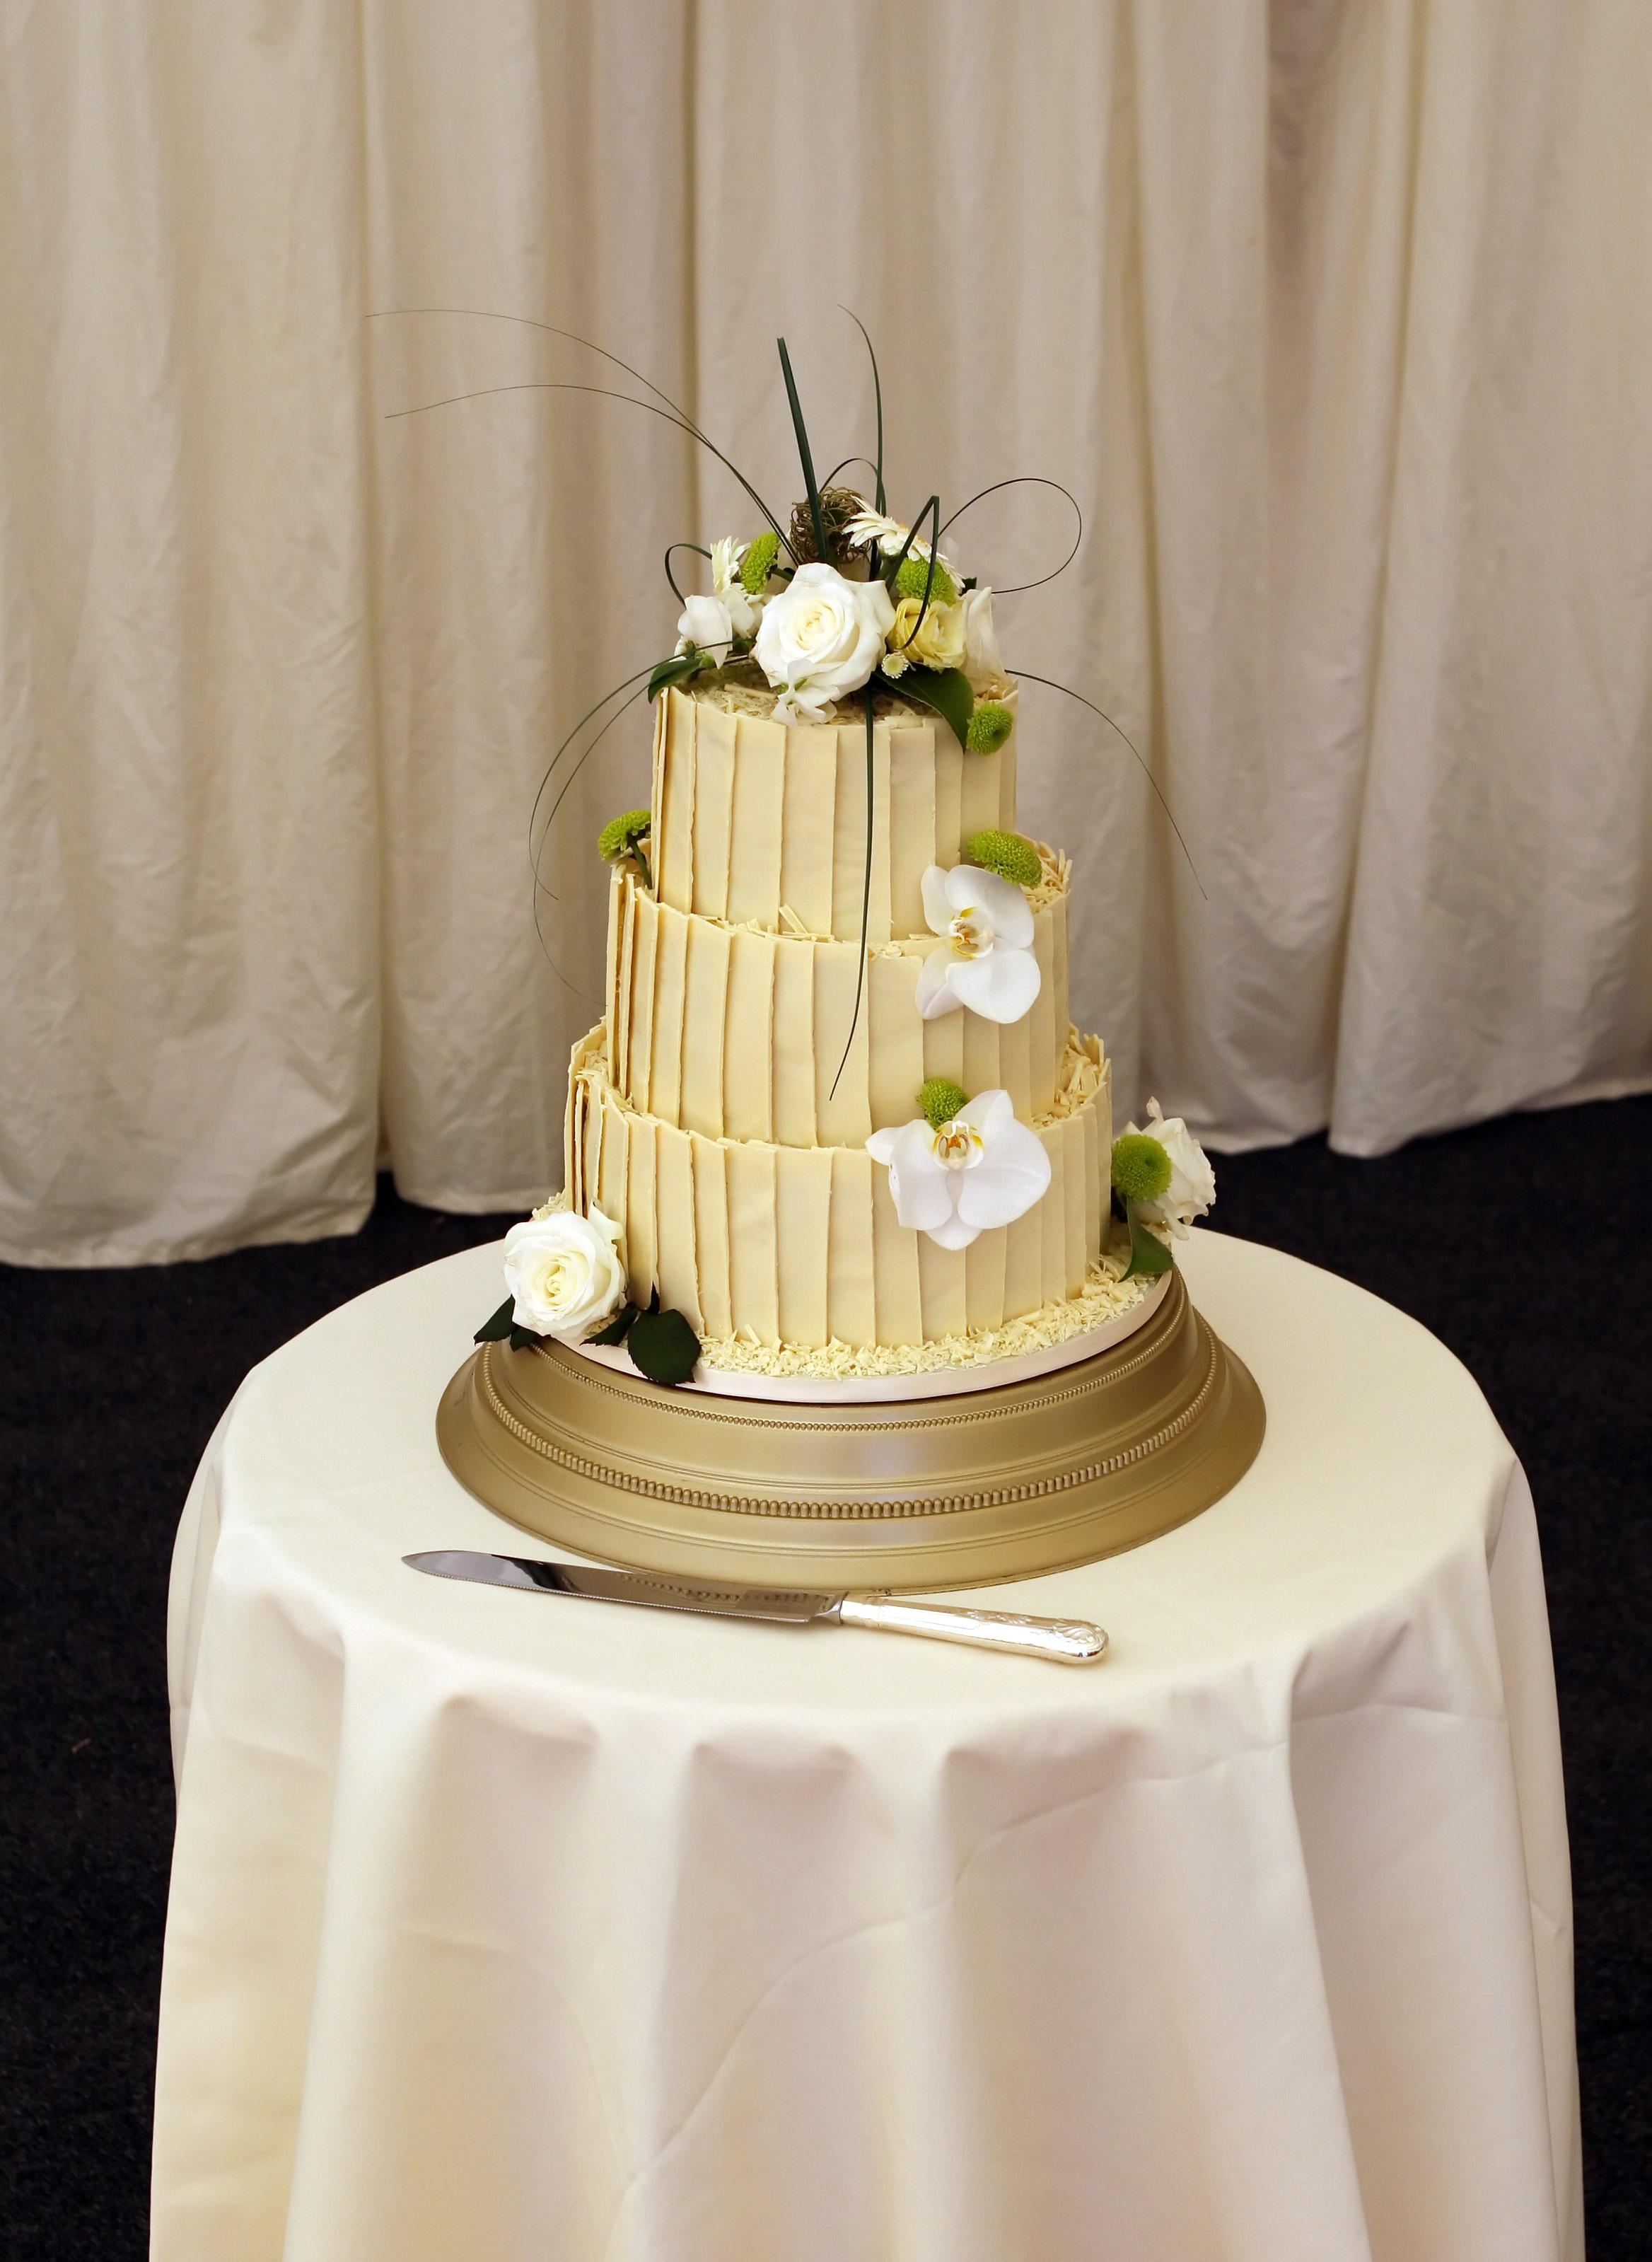 Free Images : table, white, flower, summer, celebration, food ...